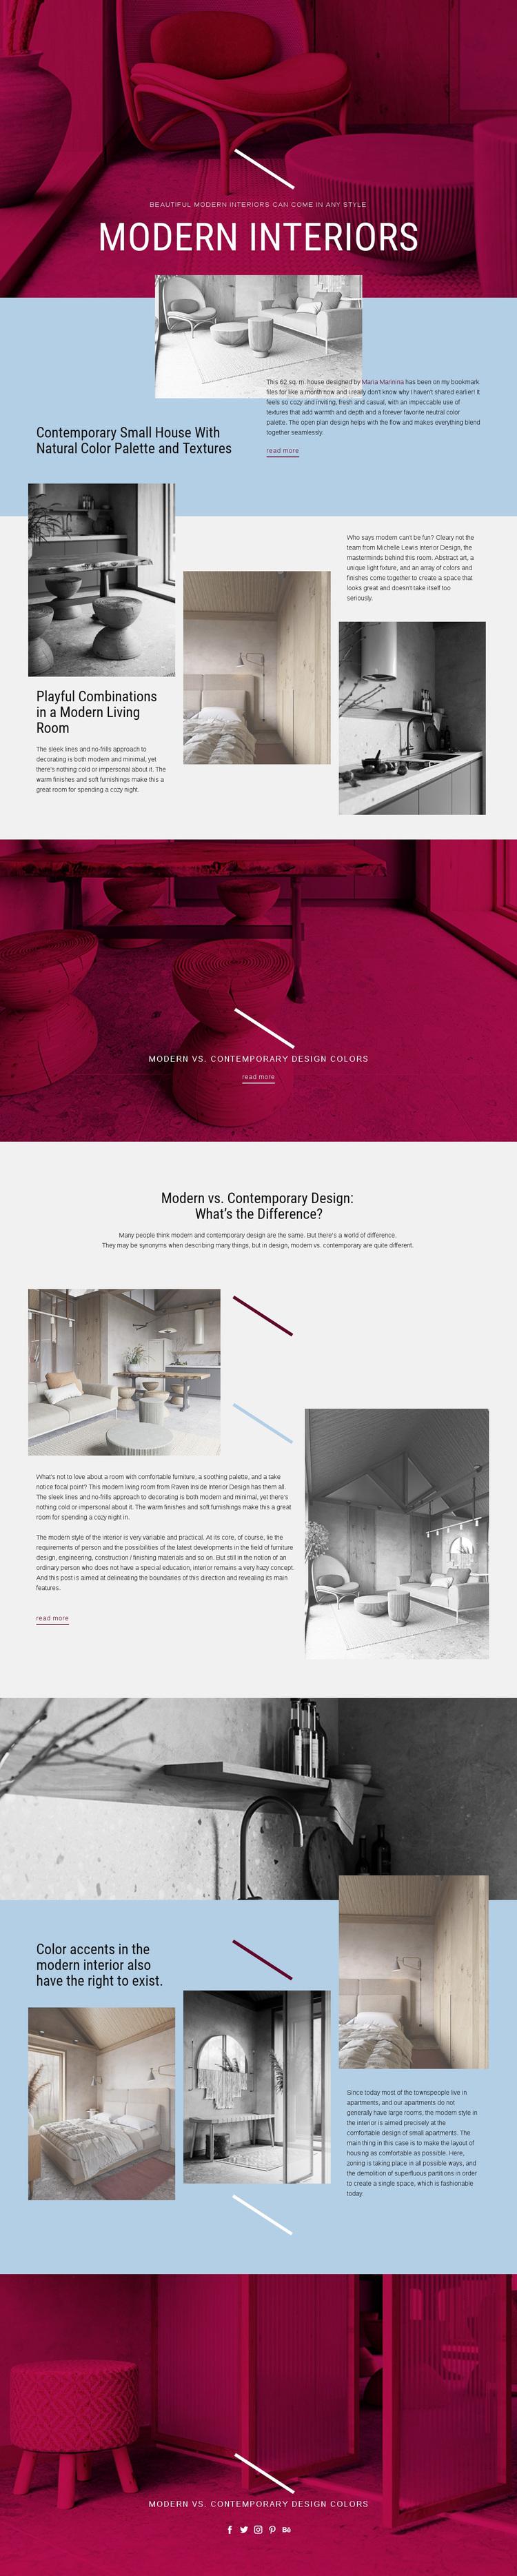 Modern Interiors Web Page Designer